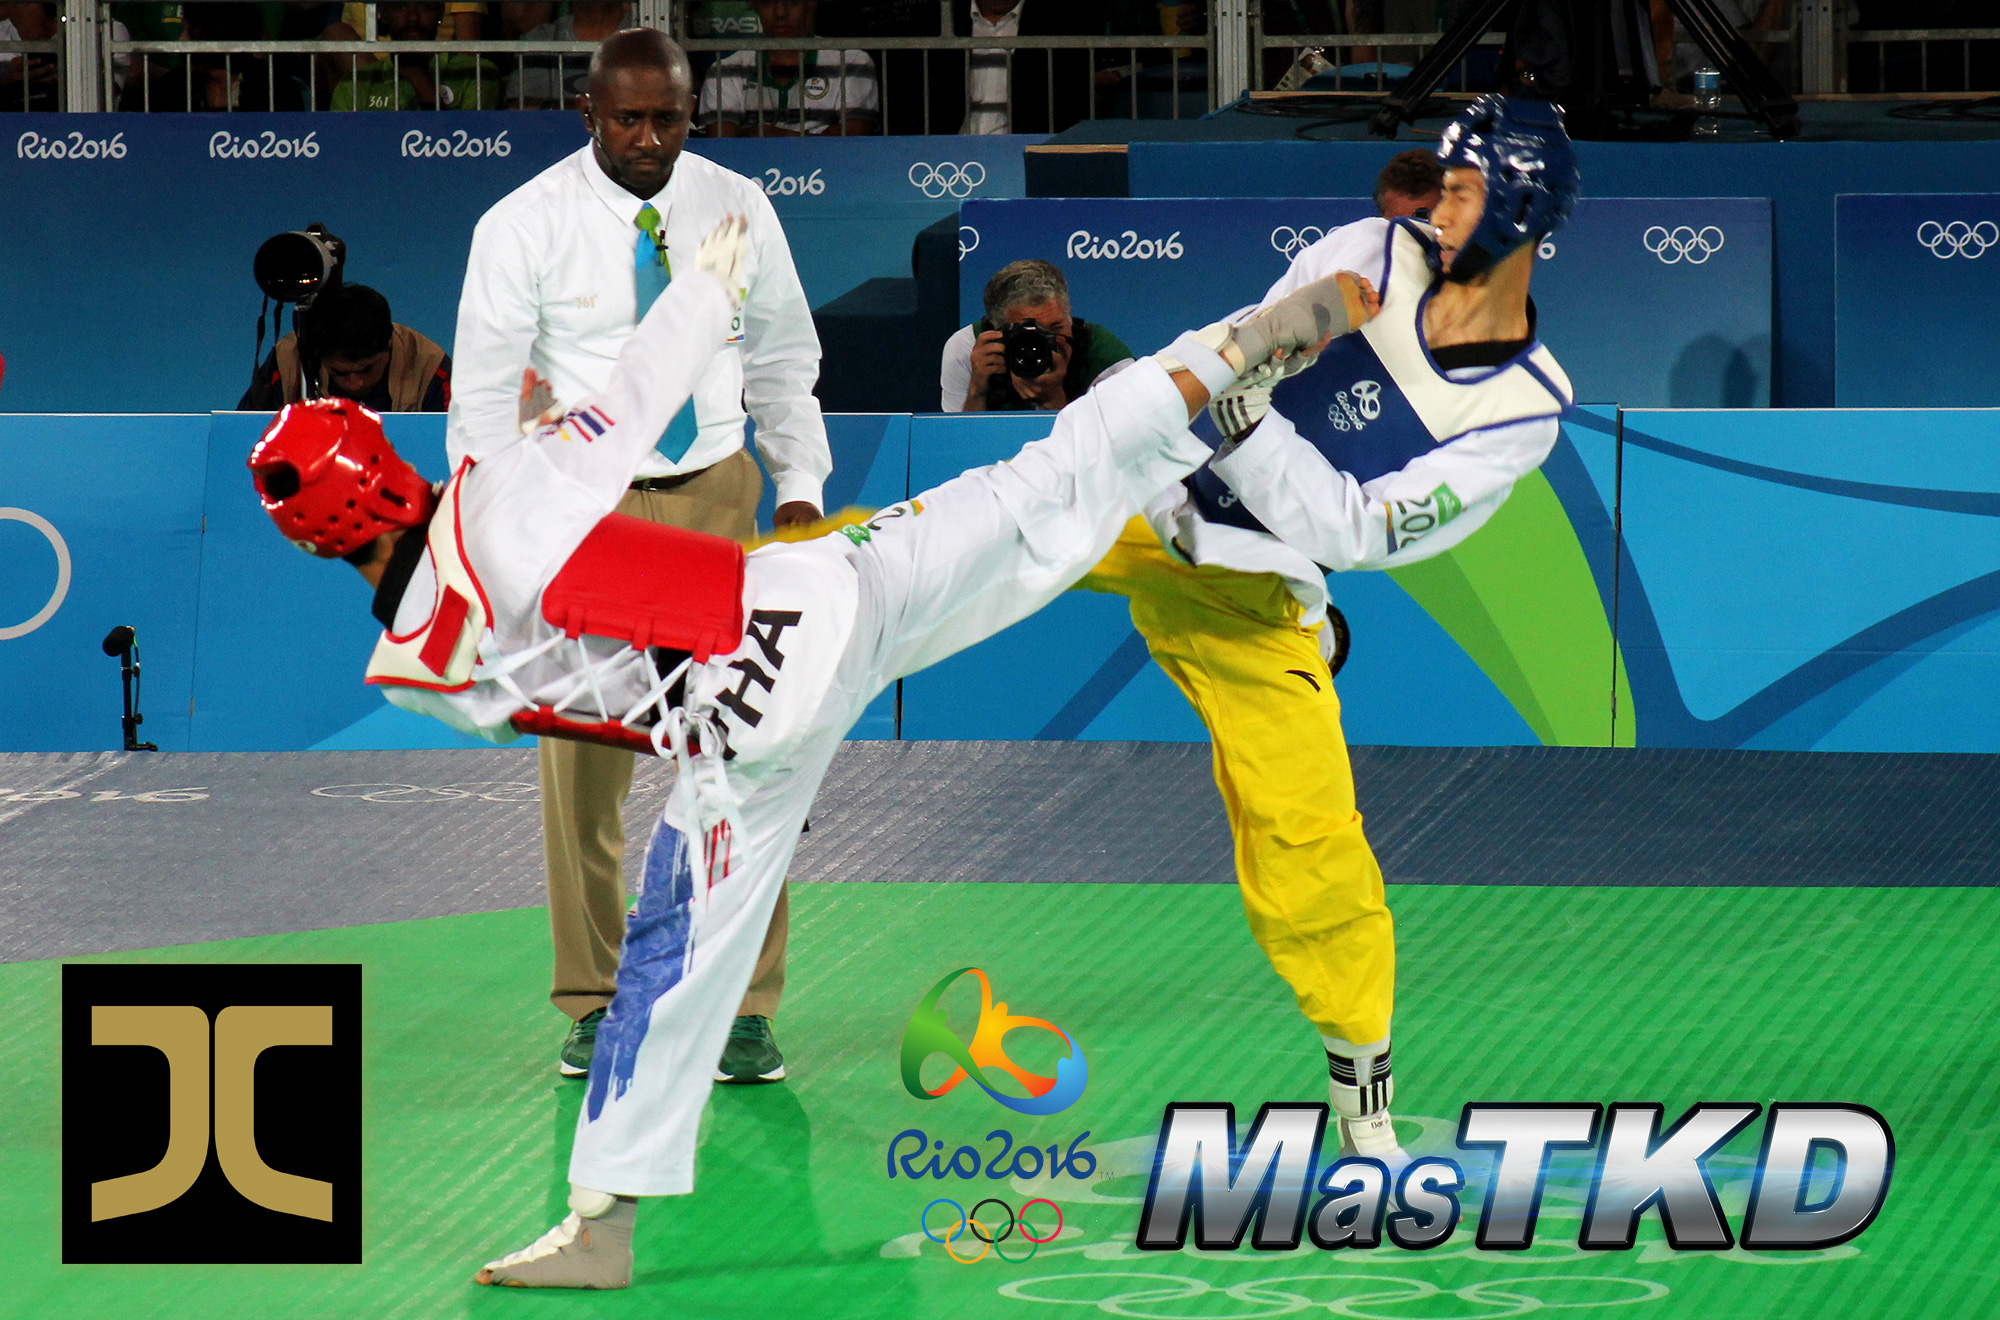 20160817_Taekwondo_JC_masTKD_Rio2016_06